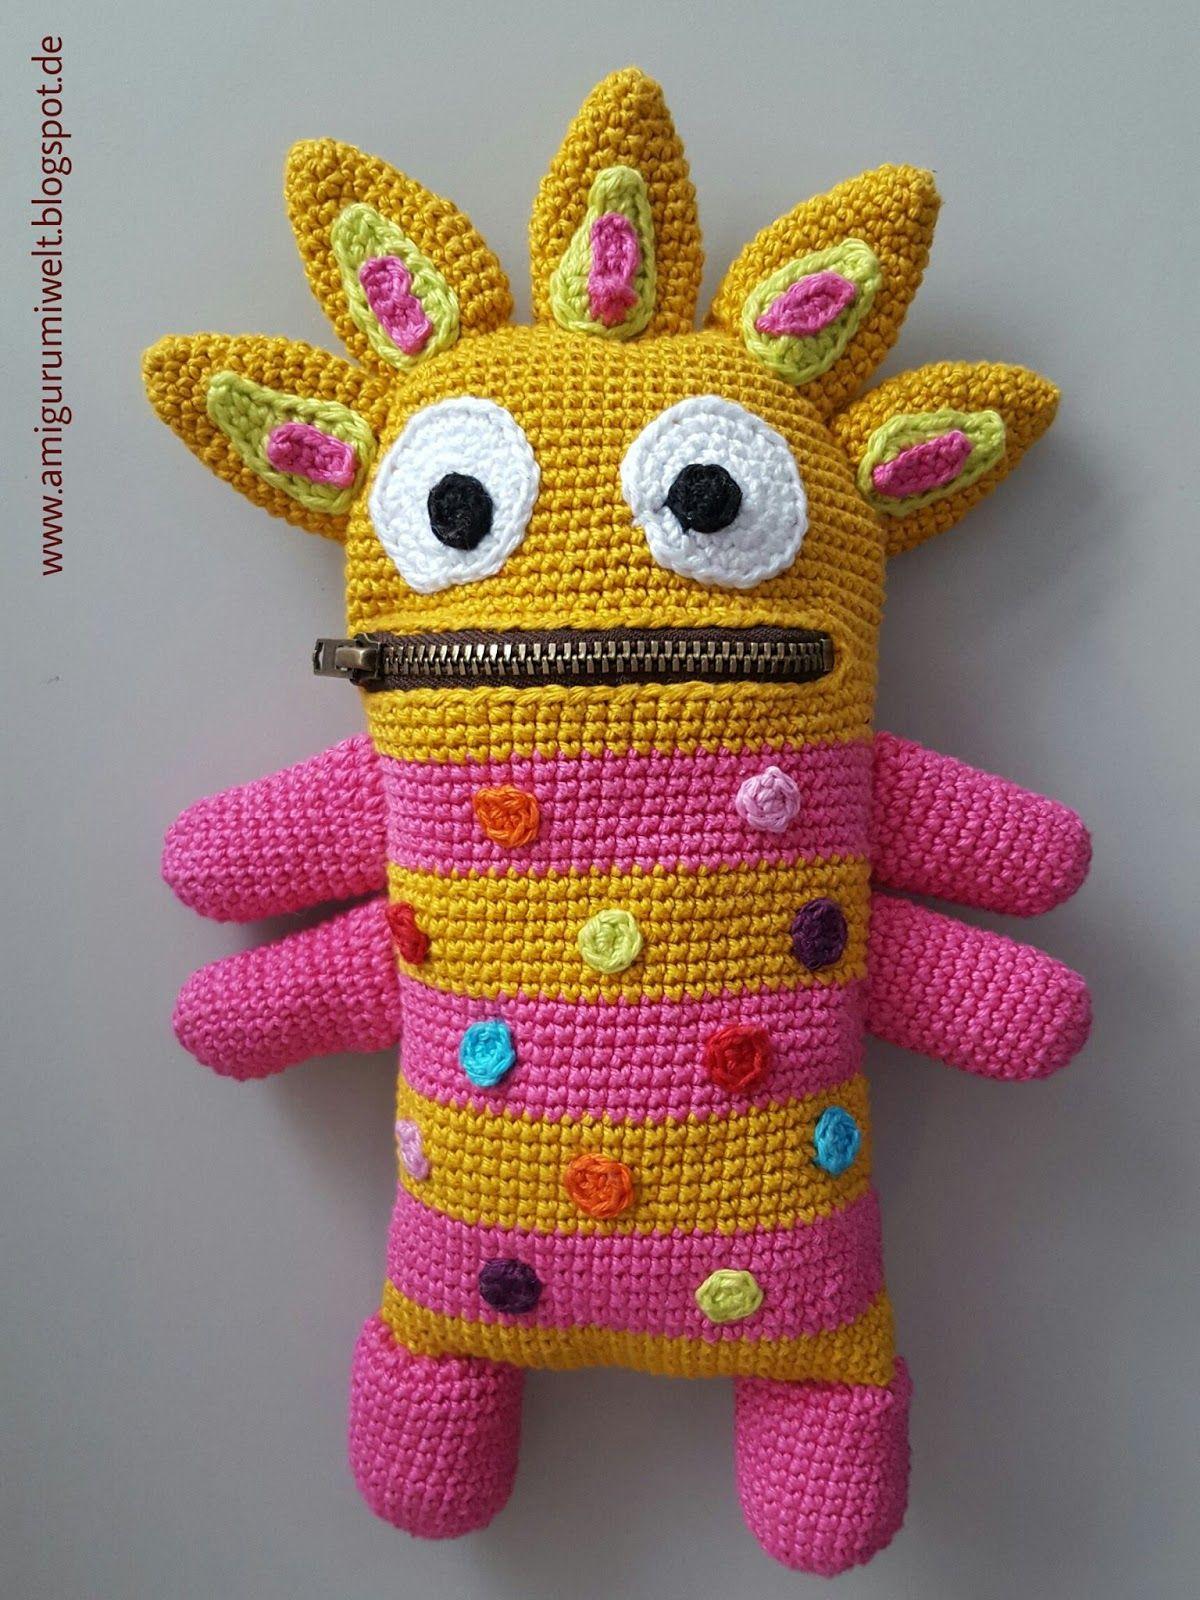 Amigurumi, häkeln, crochet, kostenlos, free, monster | Ideen ...